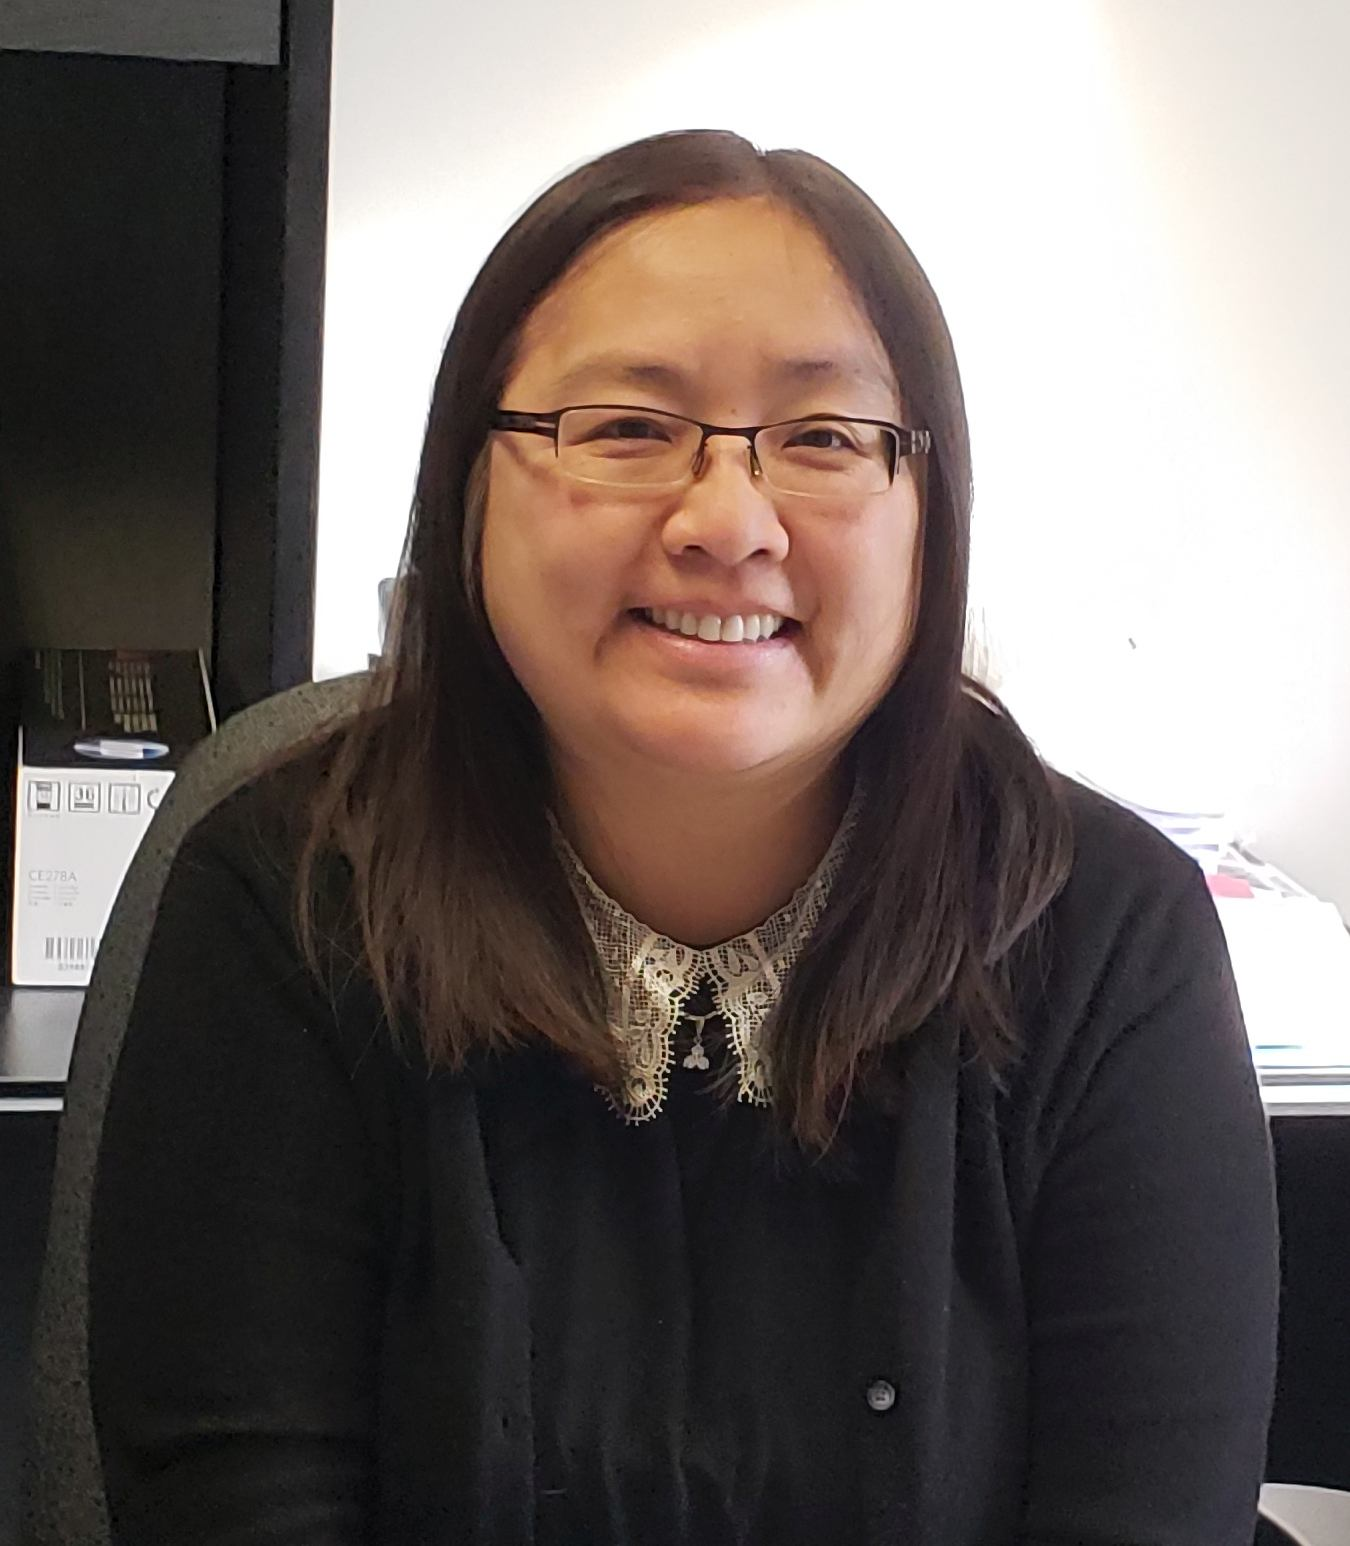 Monica Phonsavatdy, Graduate Counsellor & Administrative Assistant